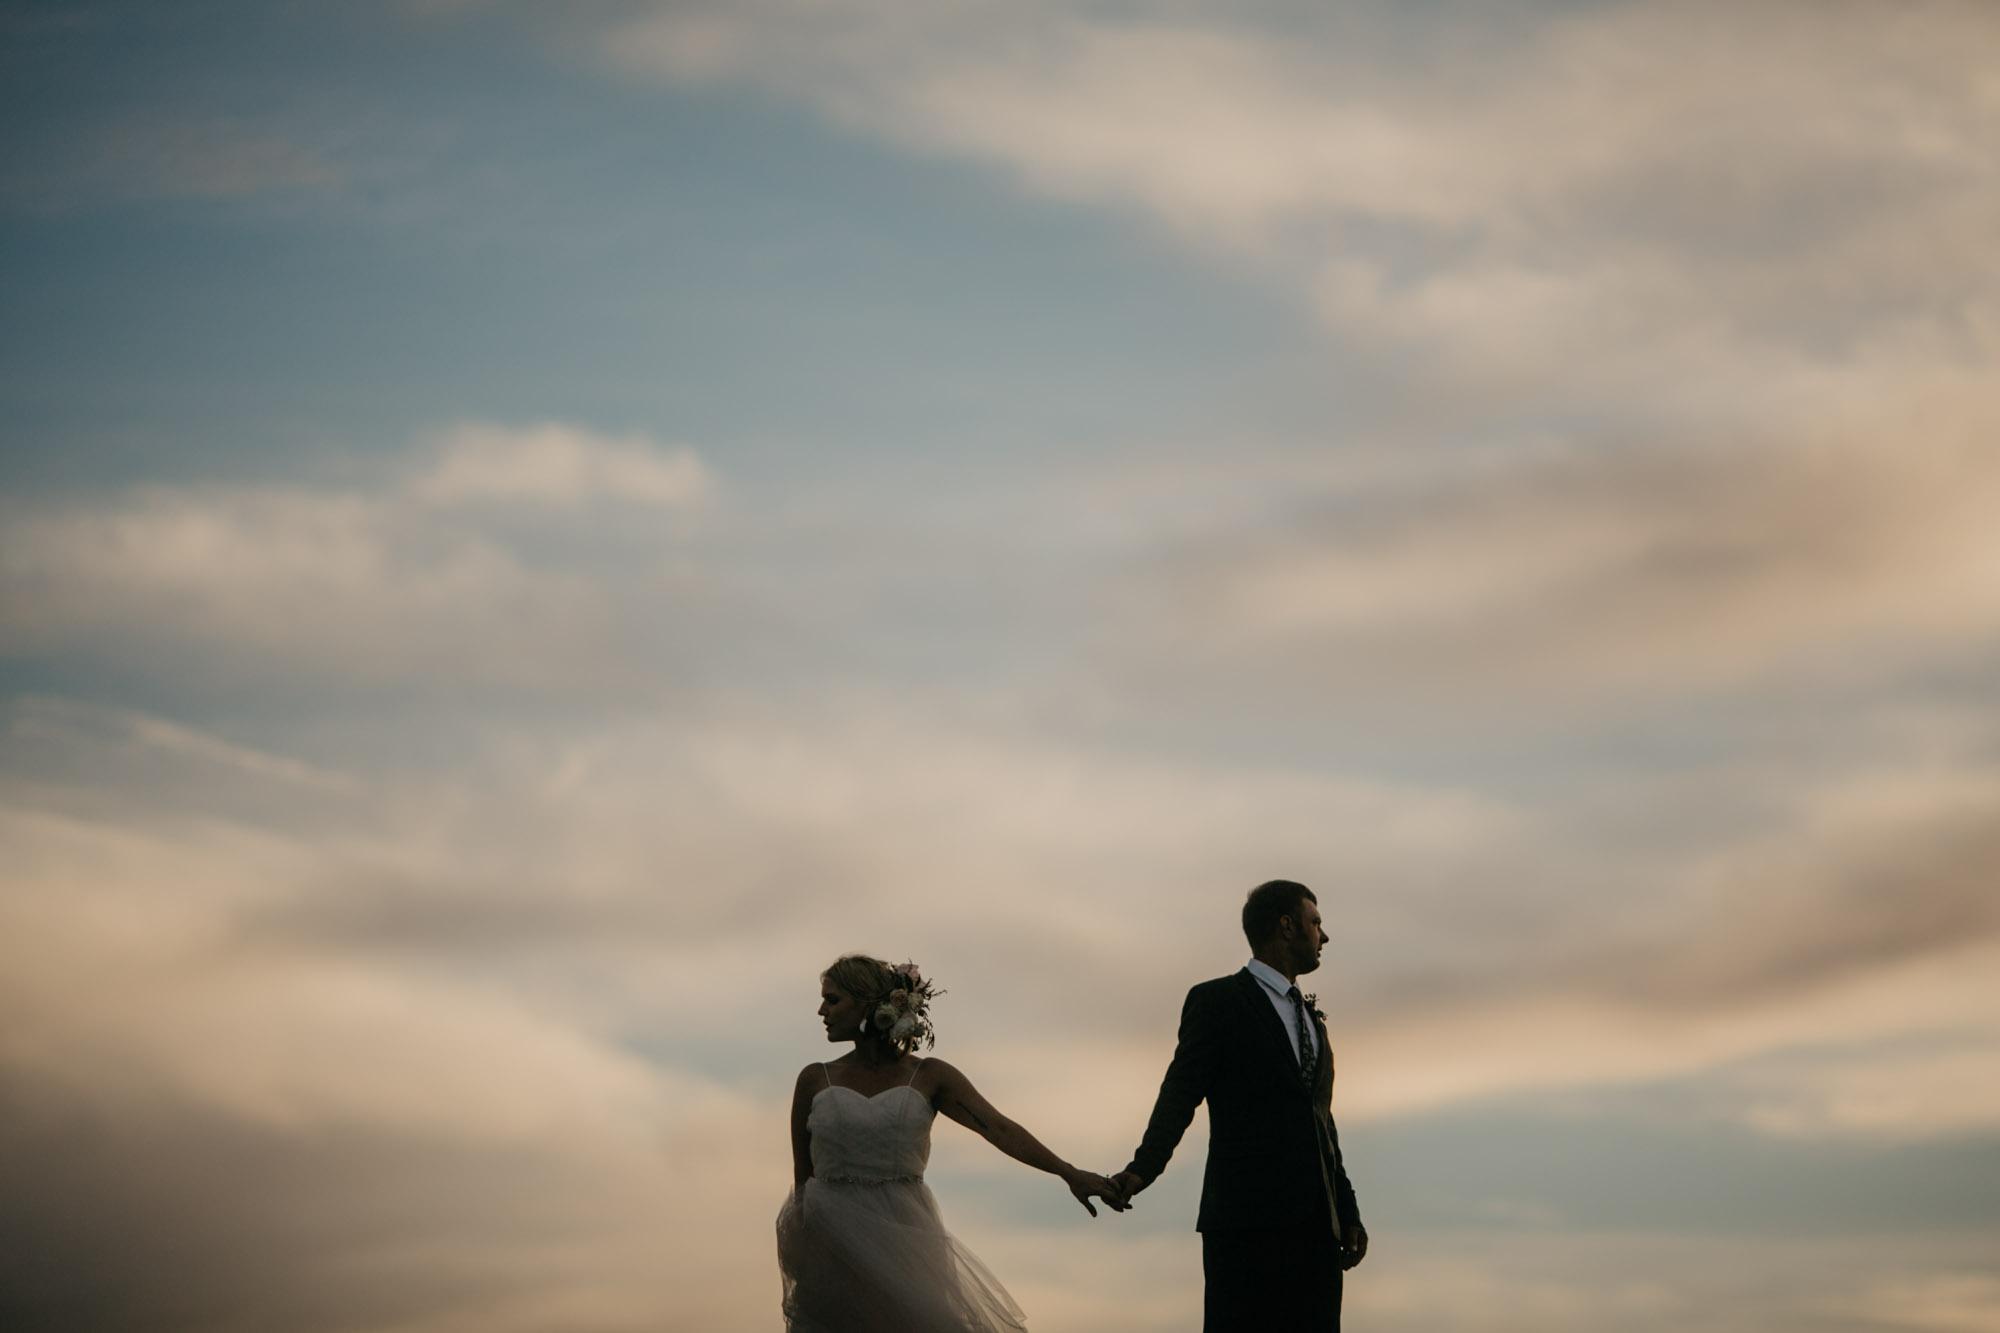 omaha-wedding-photographer-meghan-time-51.jpg